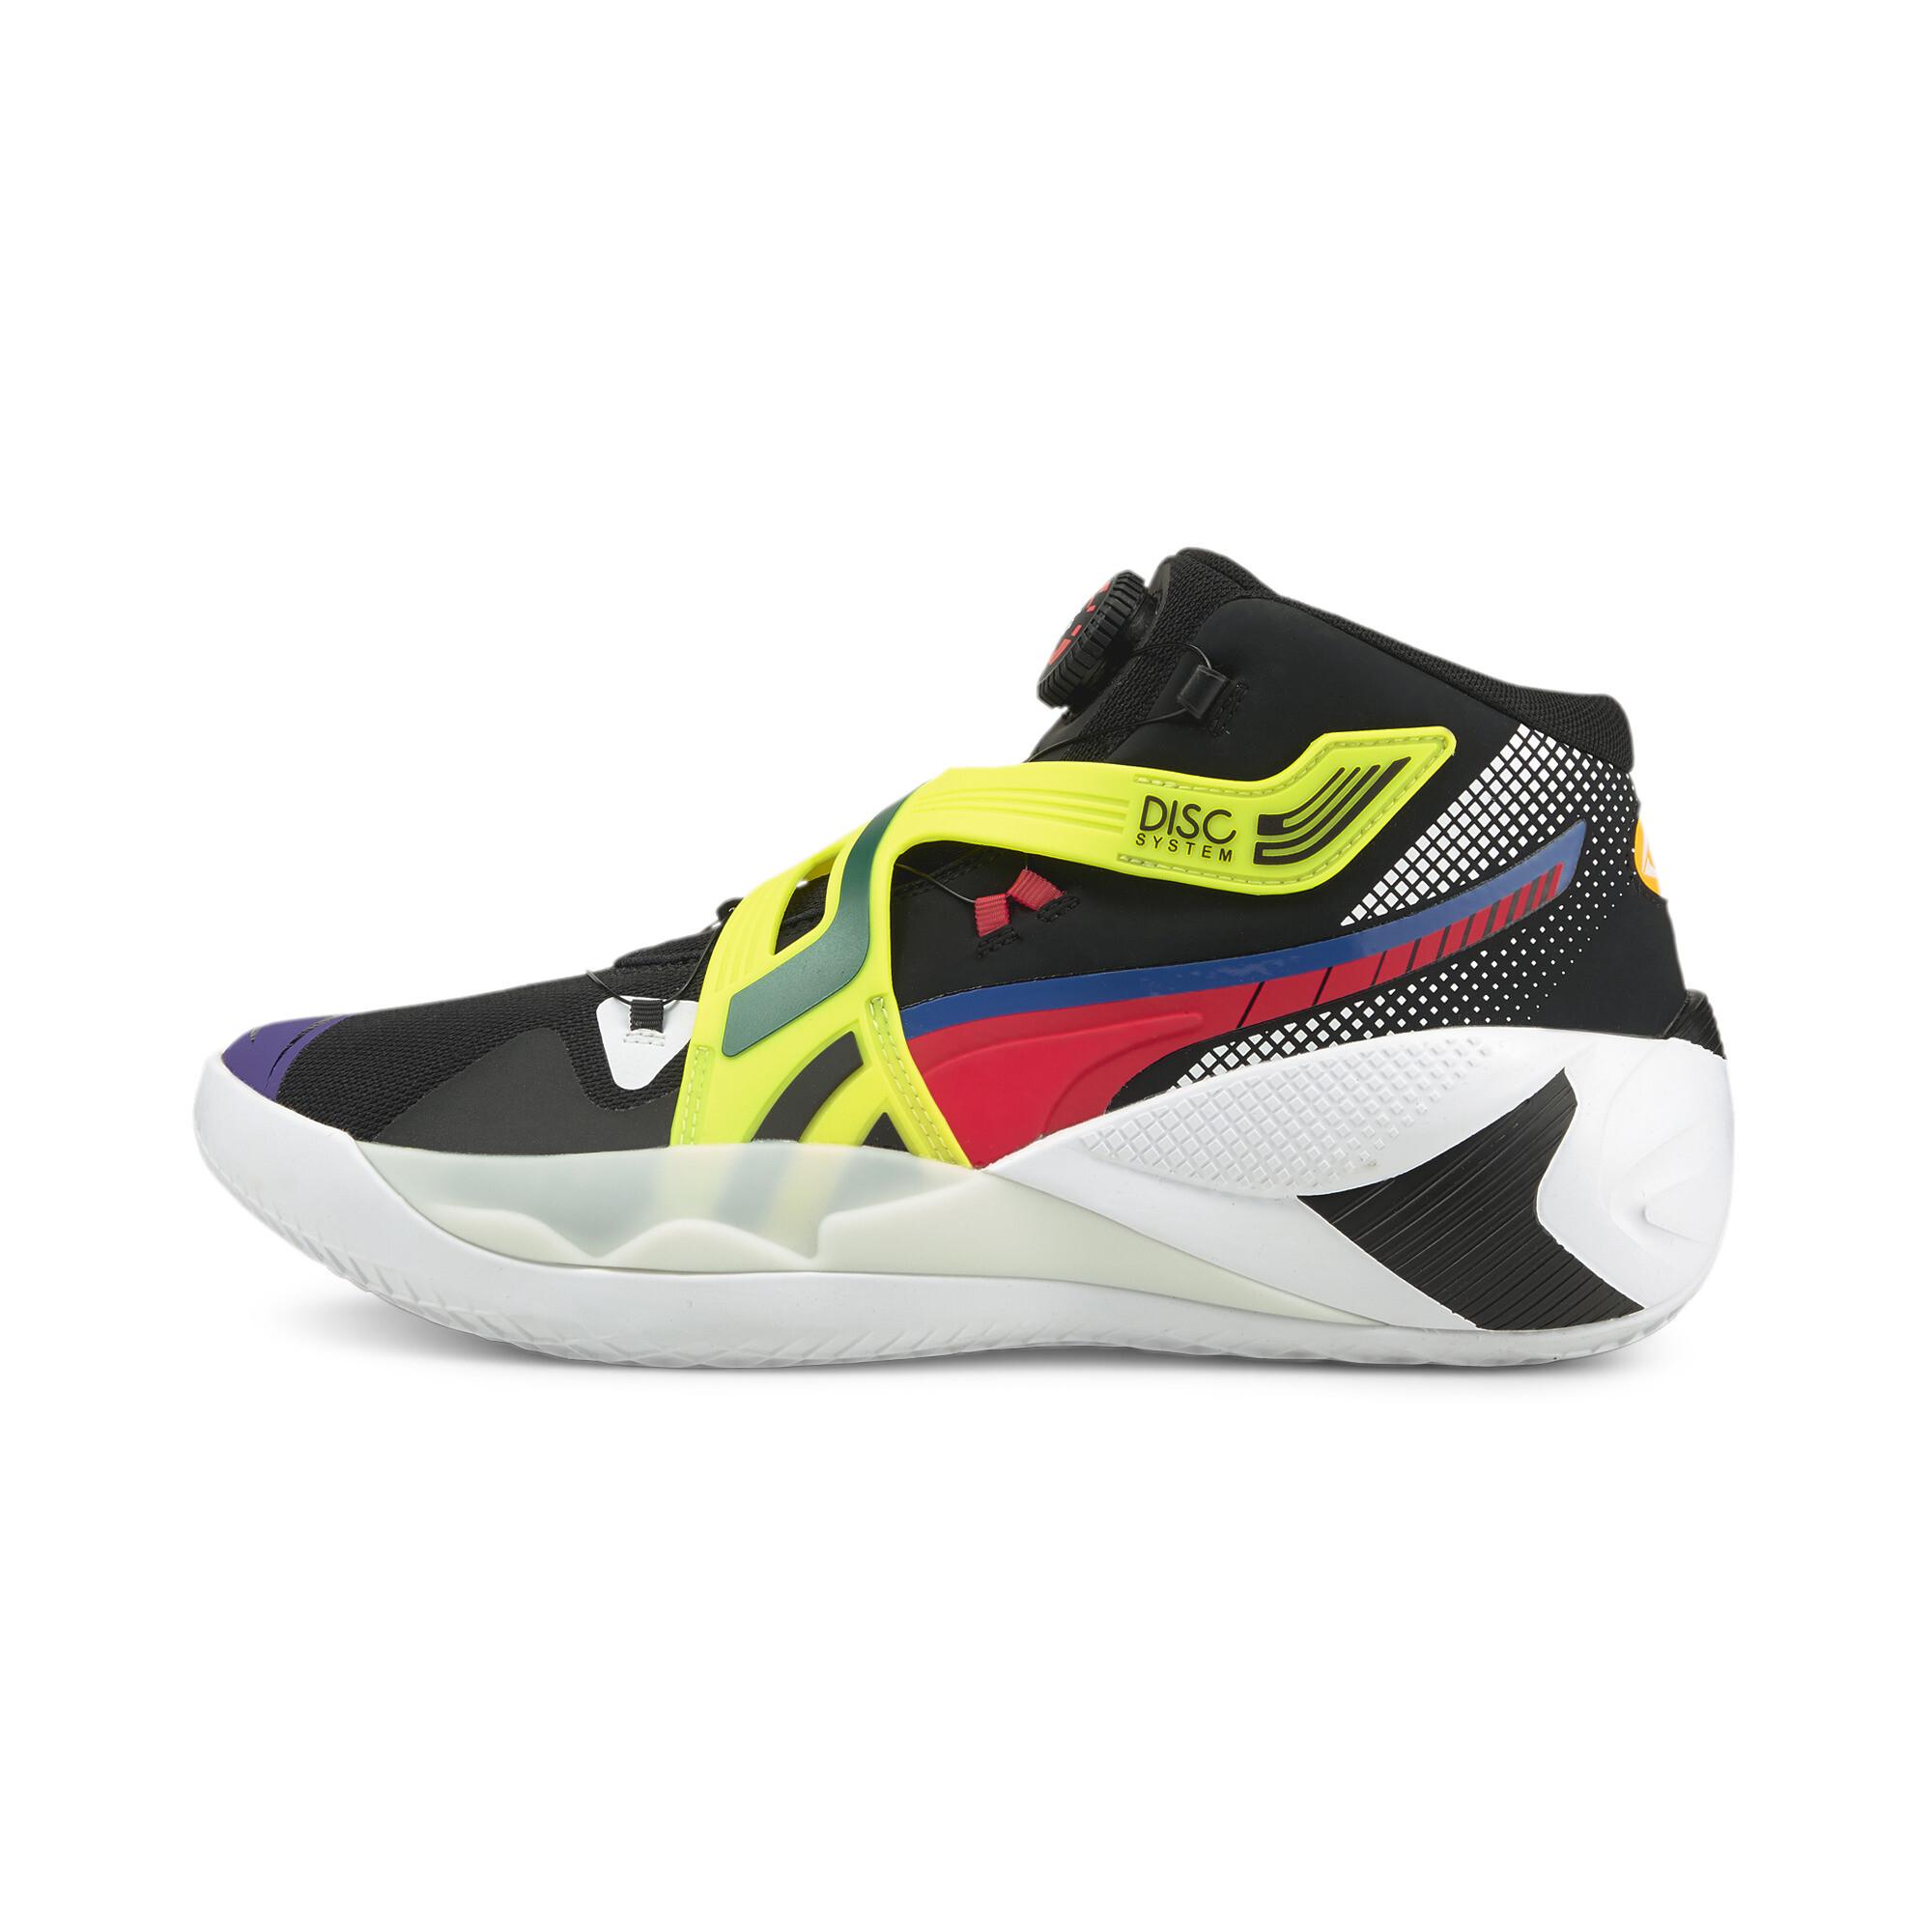 Disc Rebirth Basketball Shoes   All models   PUMA